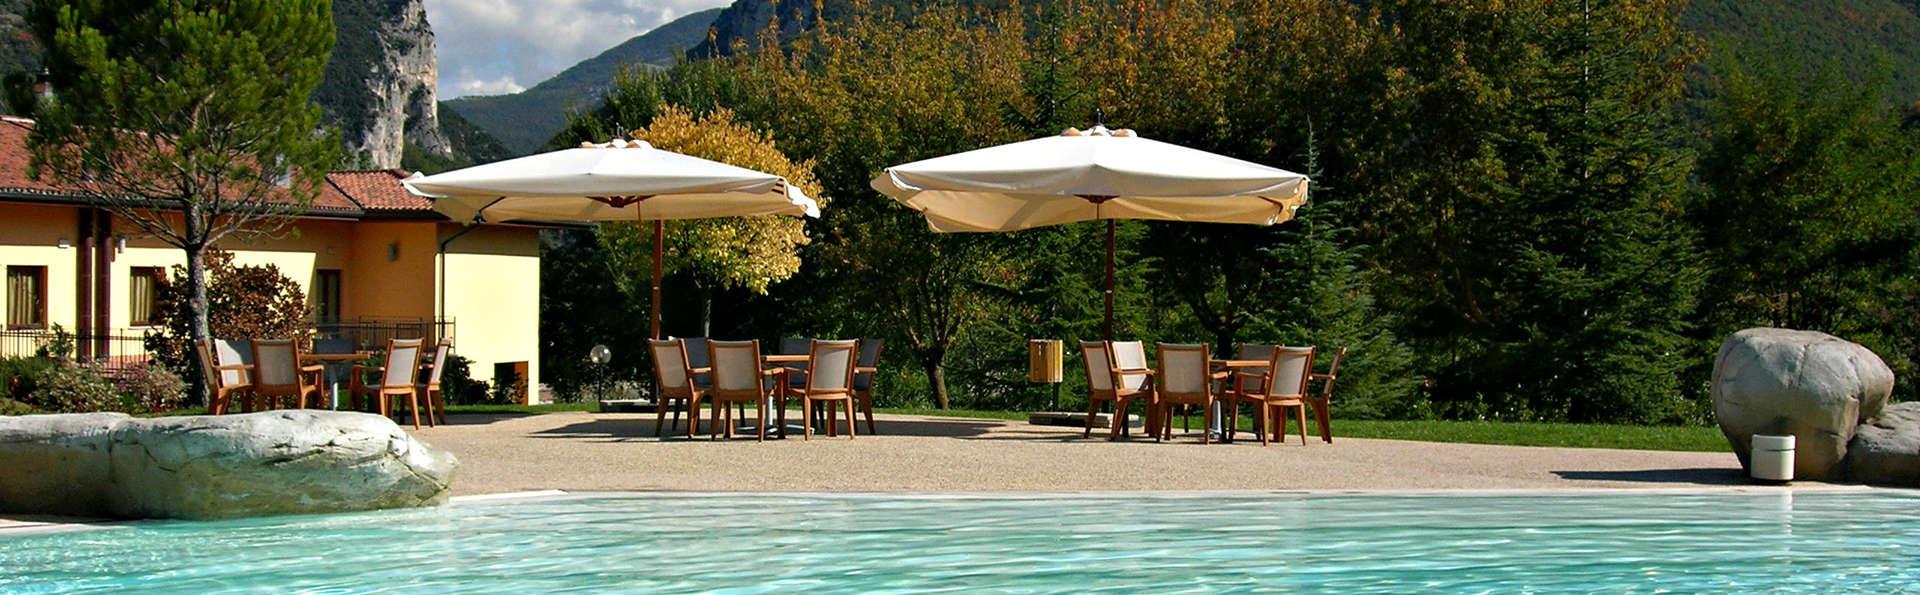 Le Grotte Hotel e Spa - edit_piscina_gola.jpg